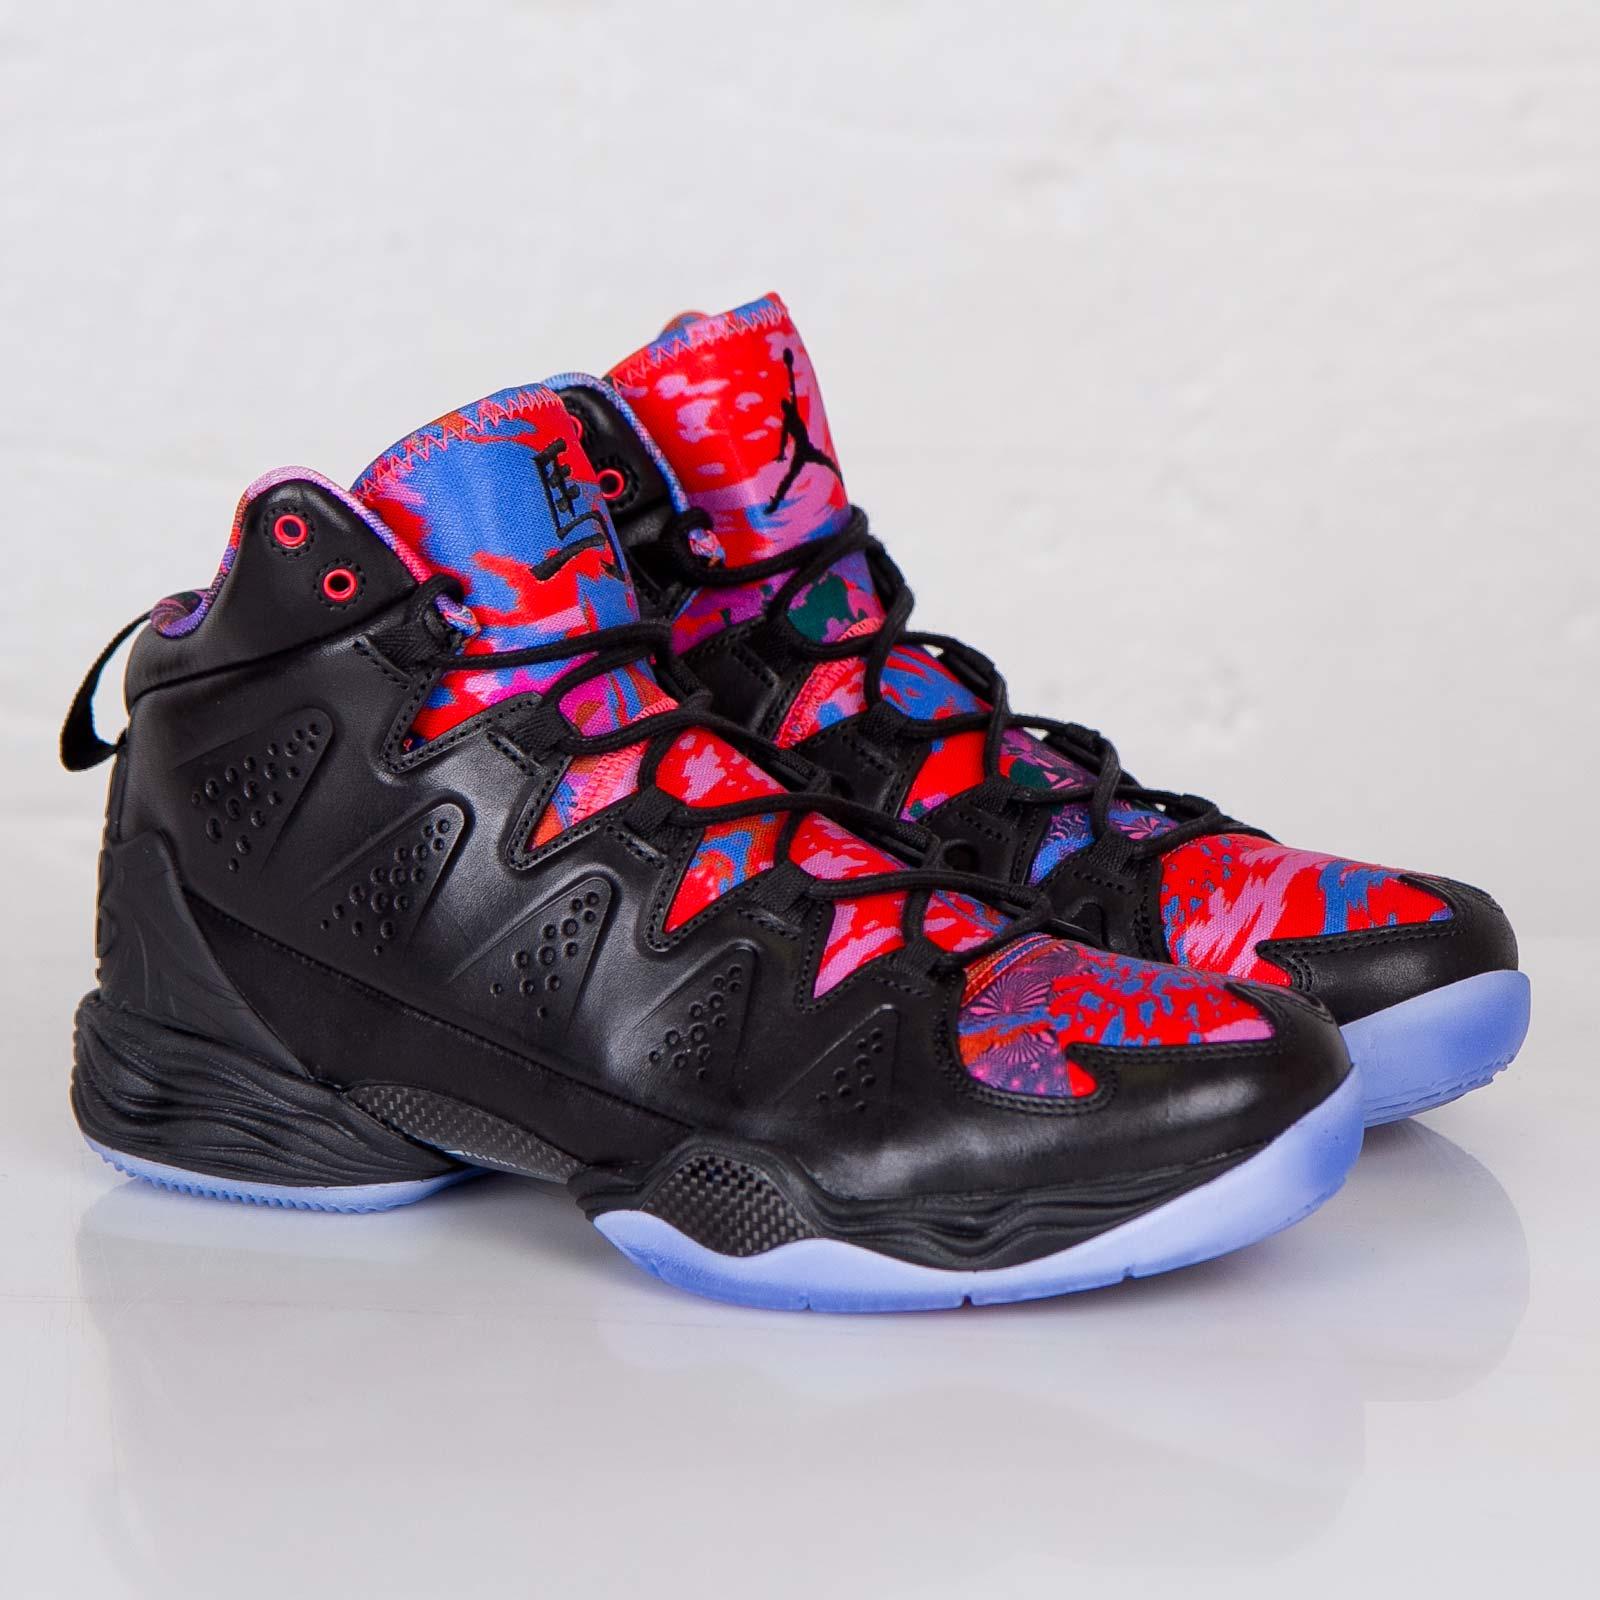 51331e8de118 Jordan Brand Jordan Melo M10 YOTH - 649352-040 - Sneakersnstuff ...